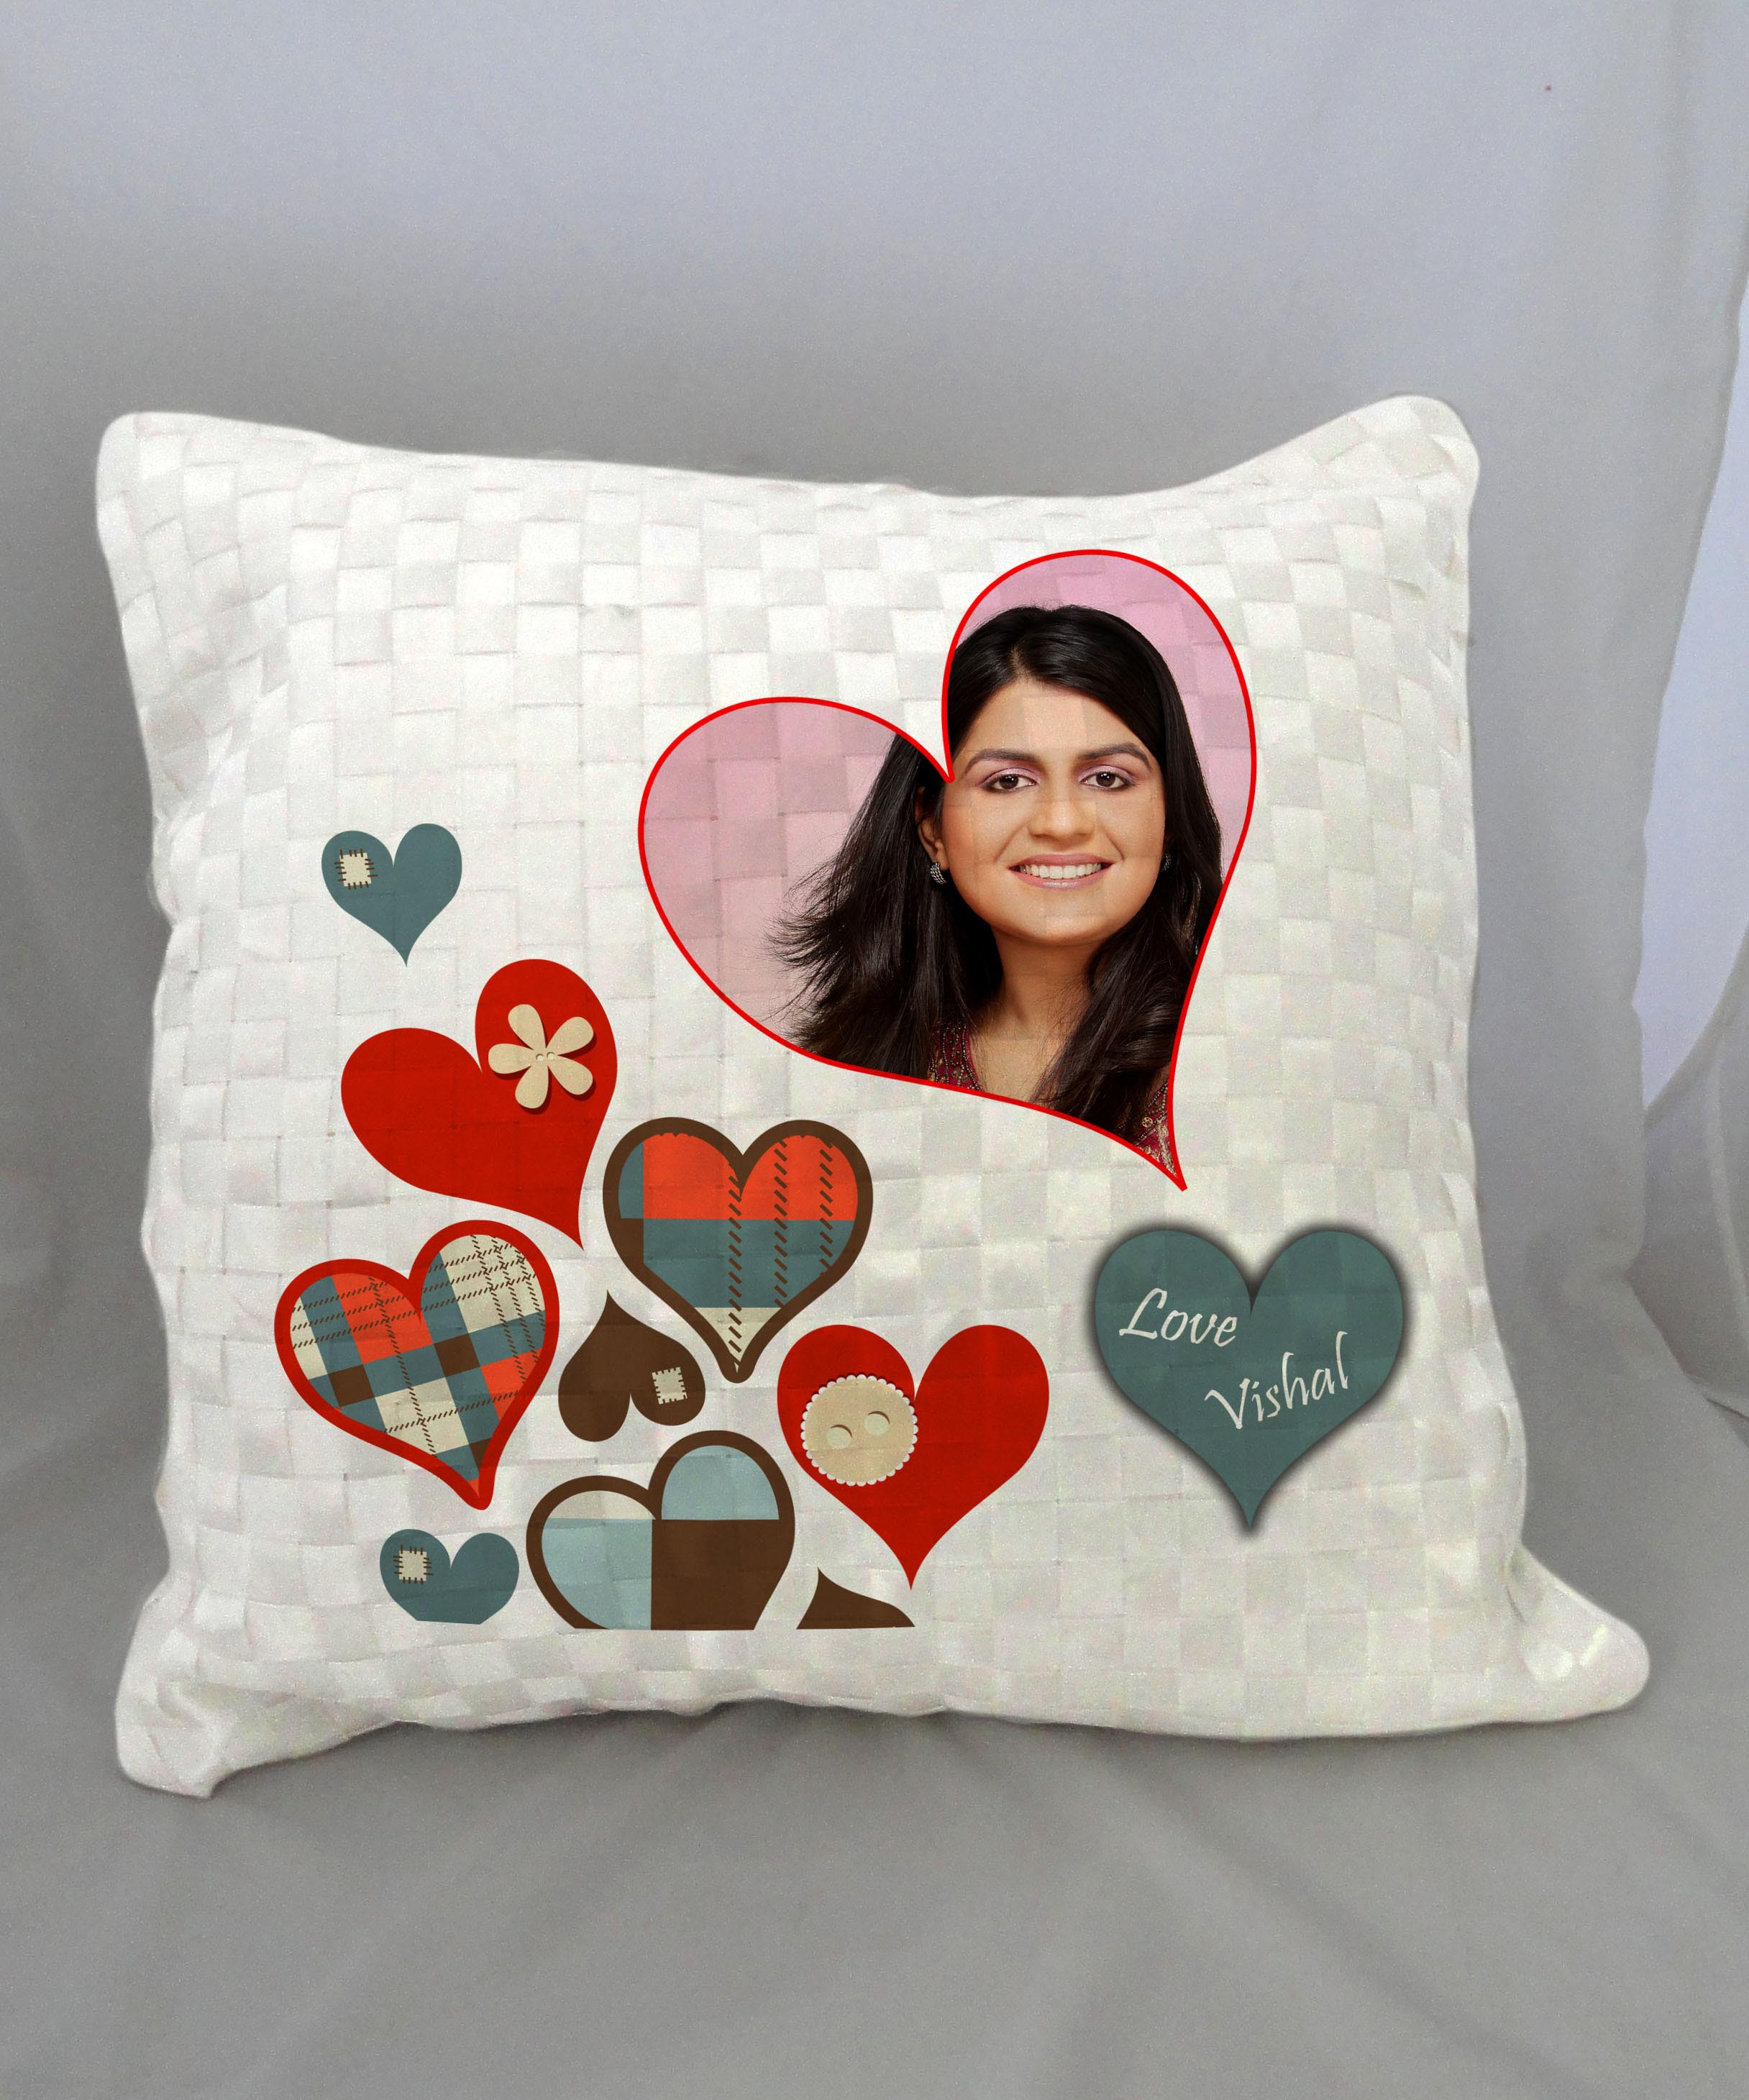 Photo Printed Pillows